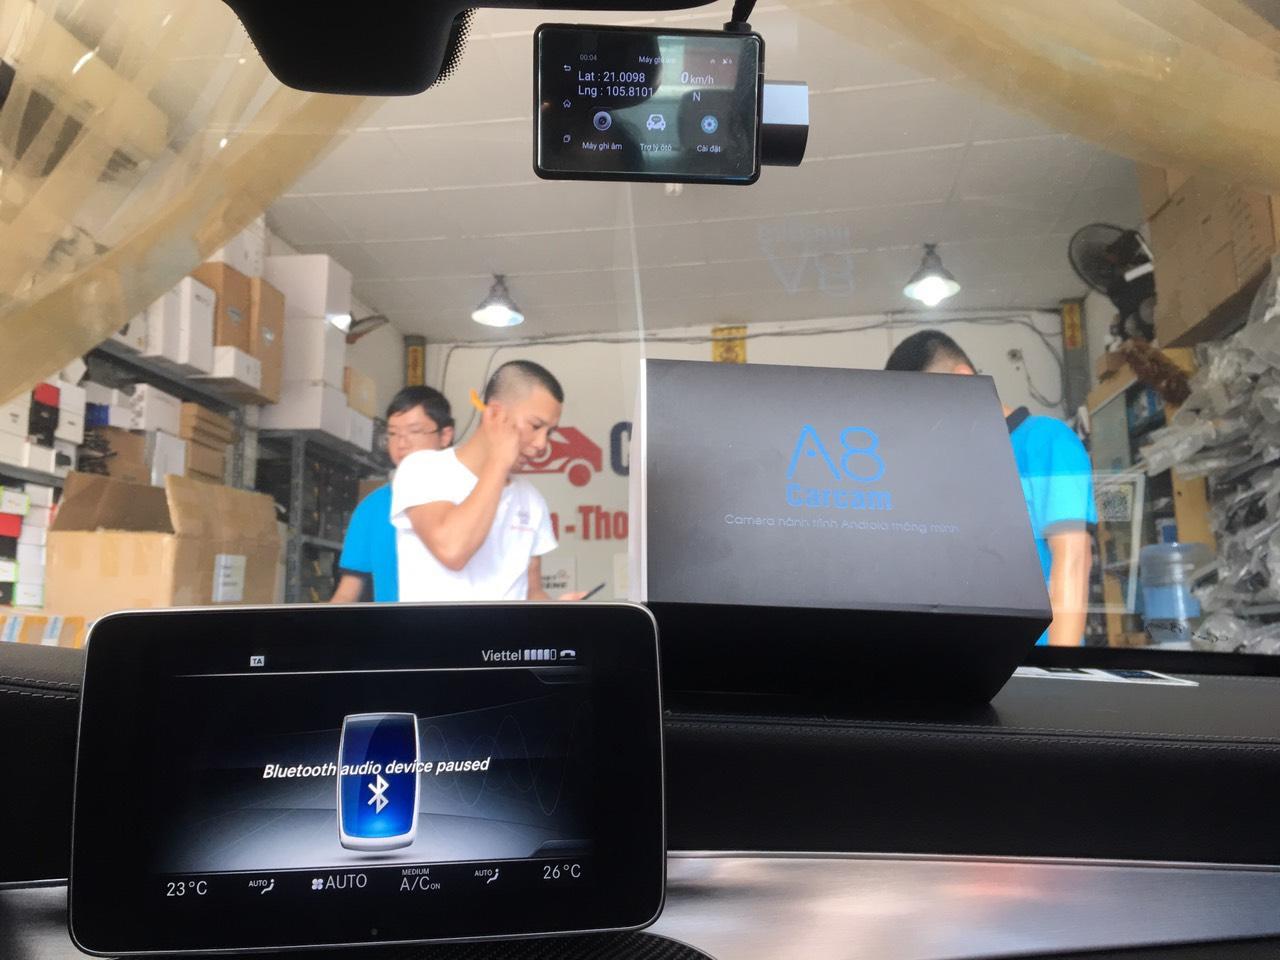 camera hanh trinh A8 android Carcam